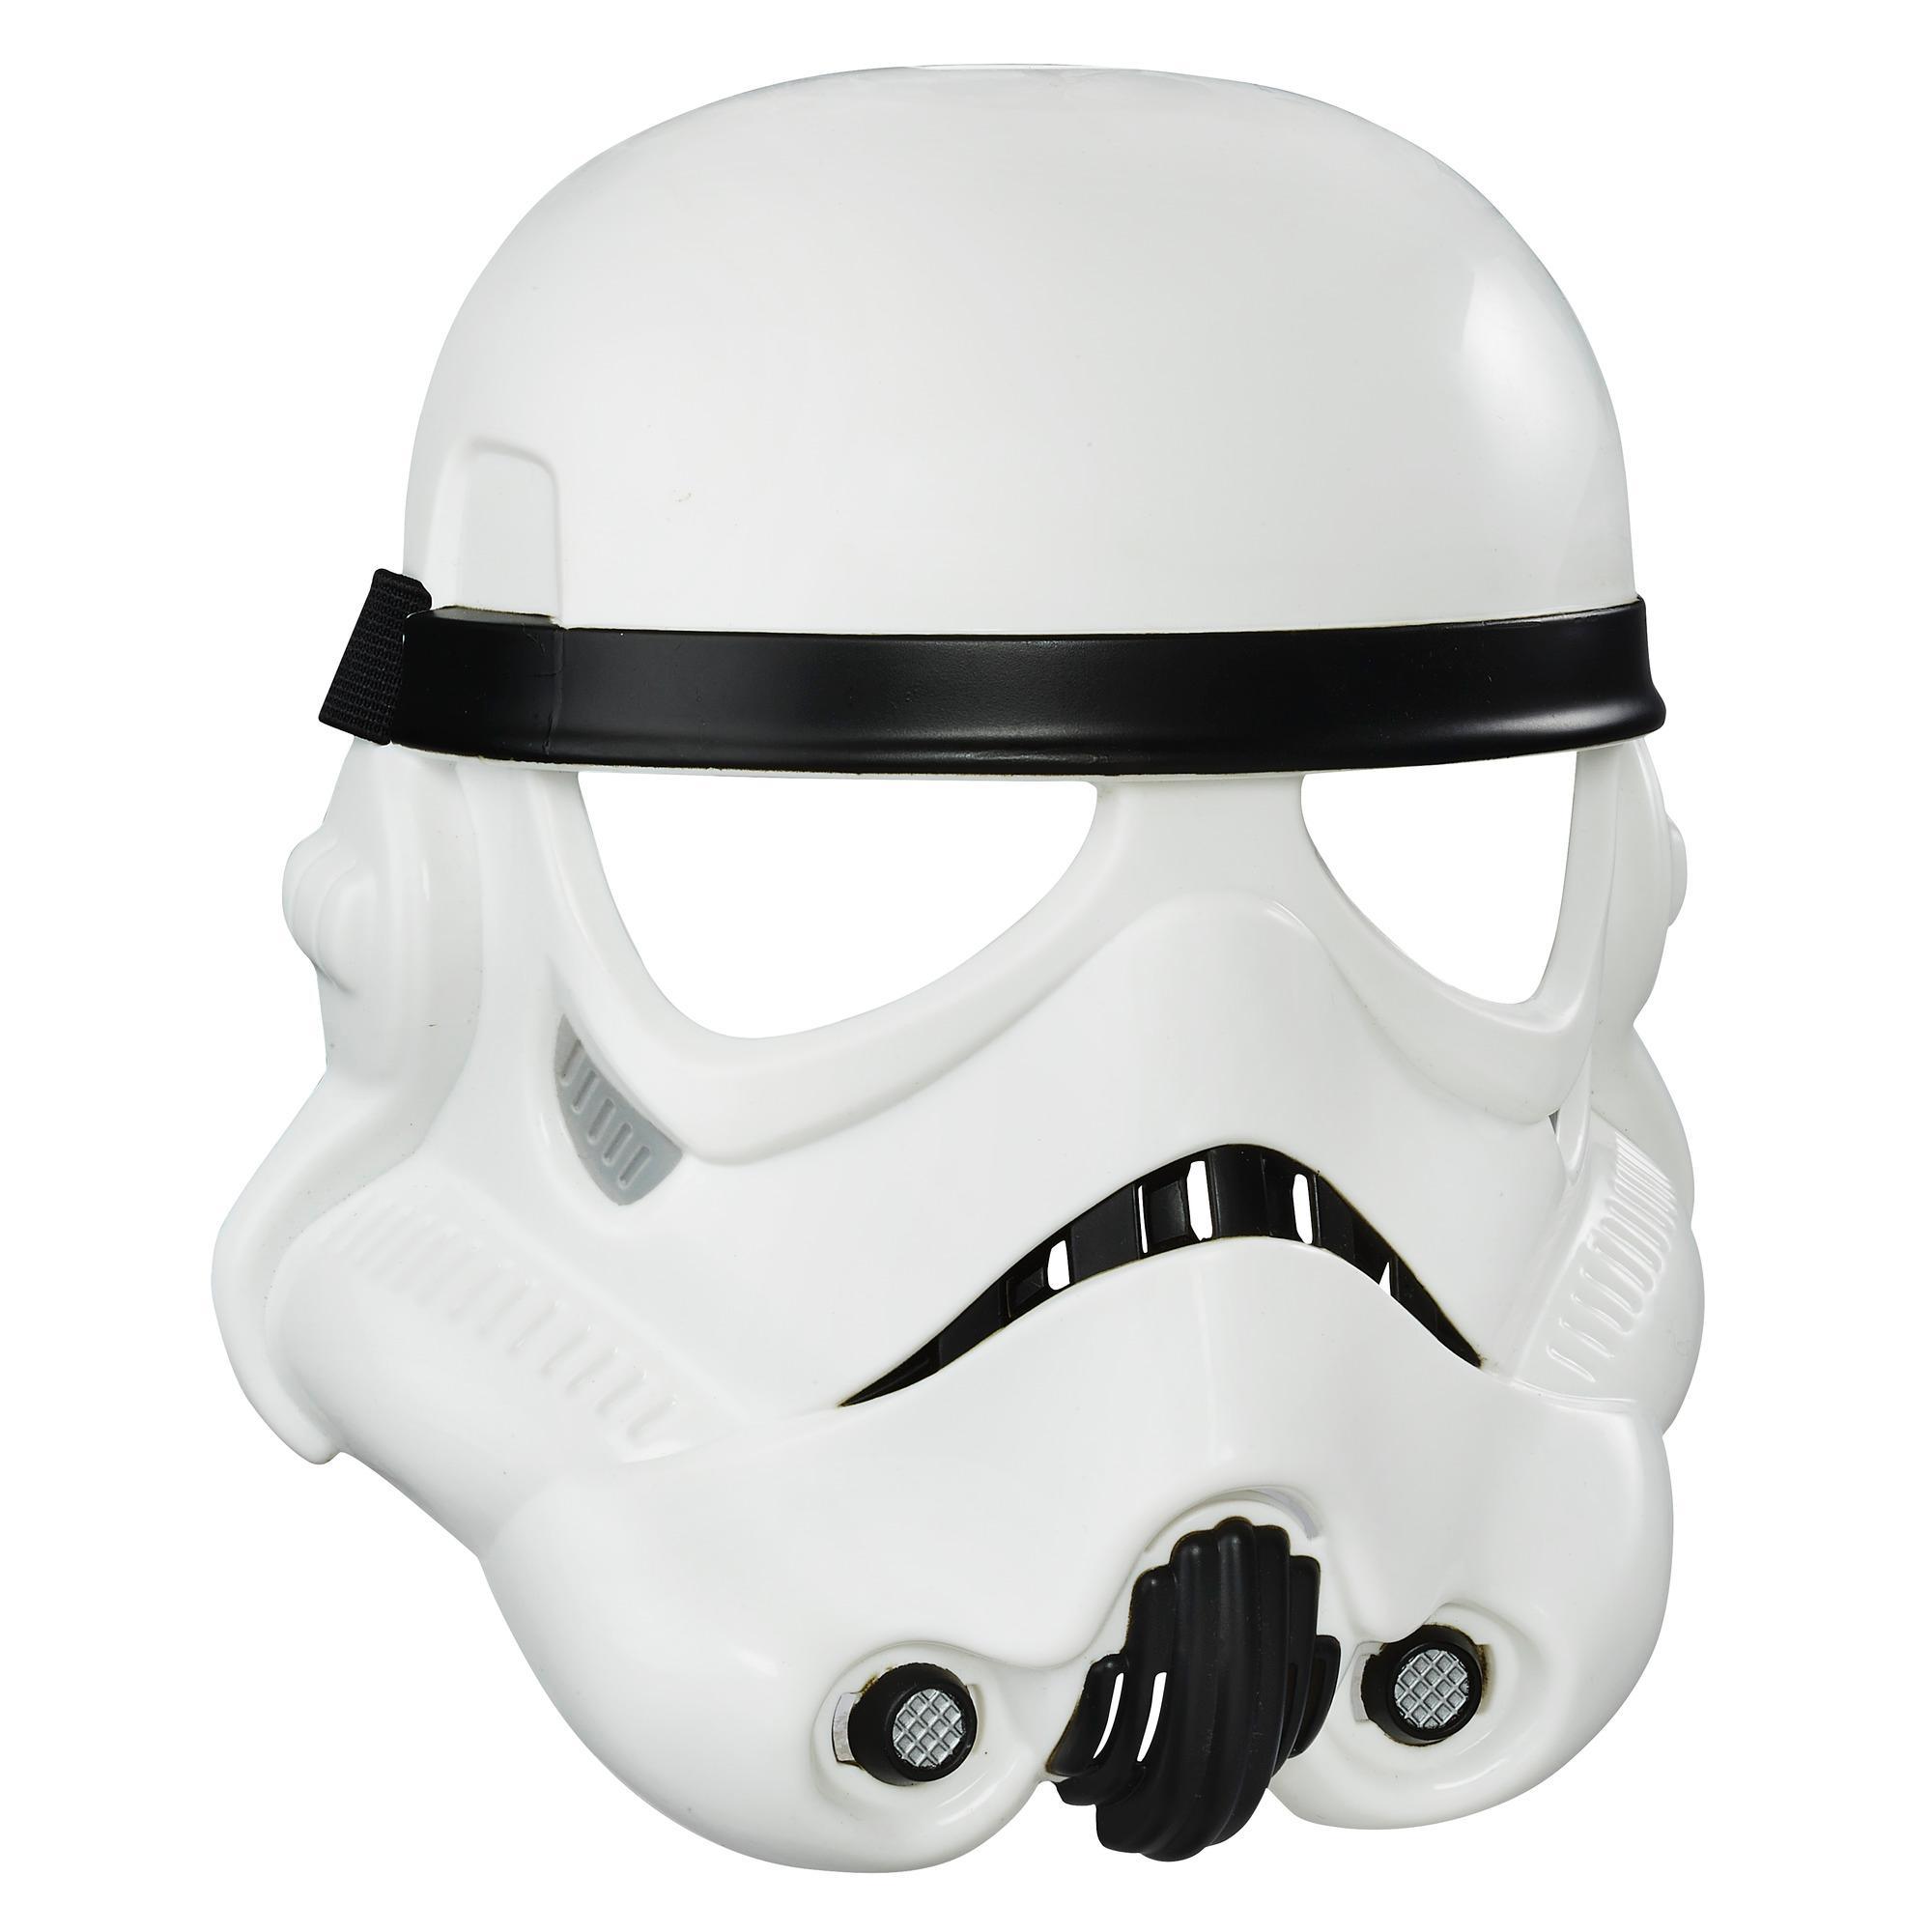 Star Wars Rogue One - Masque de Stormtrooper impérial